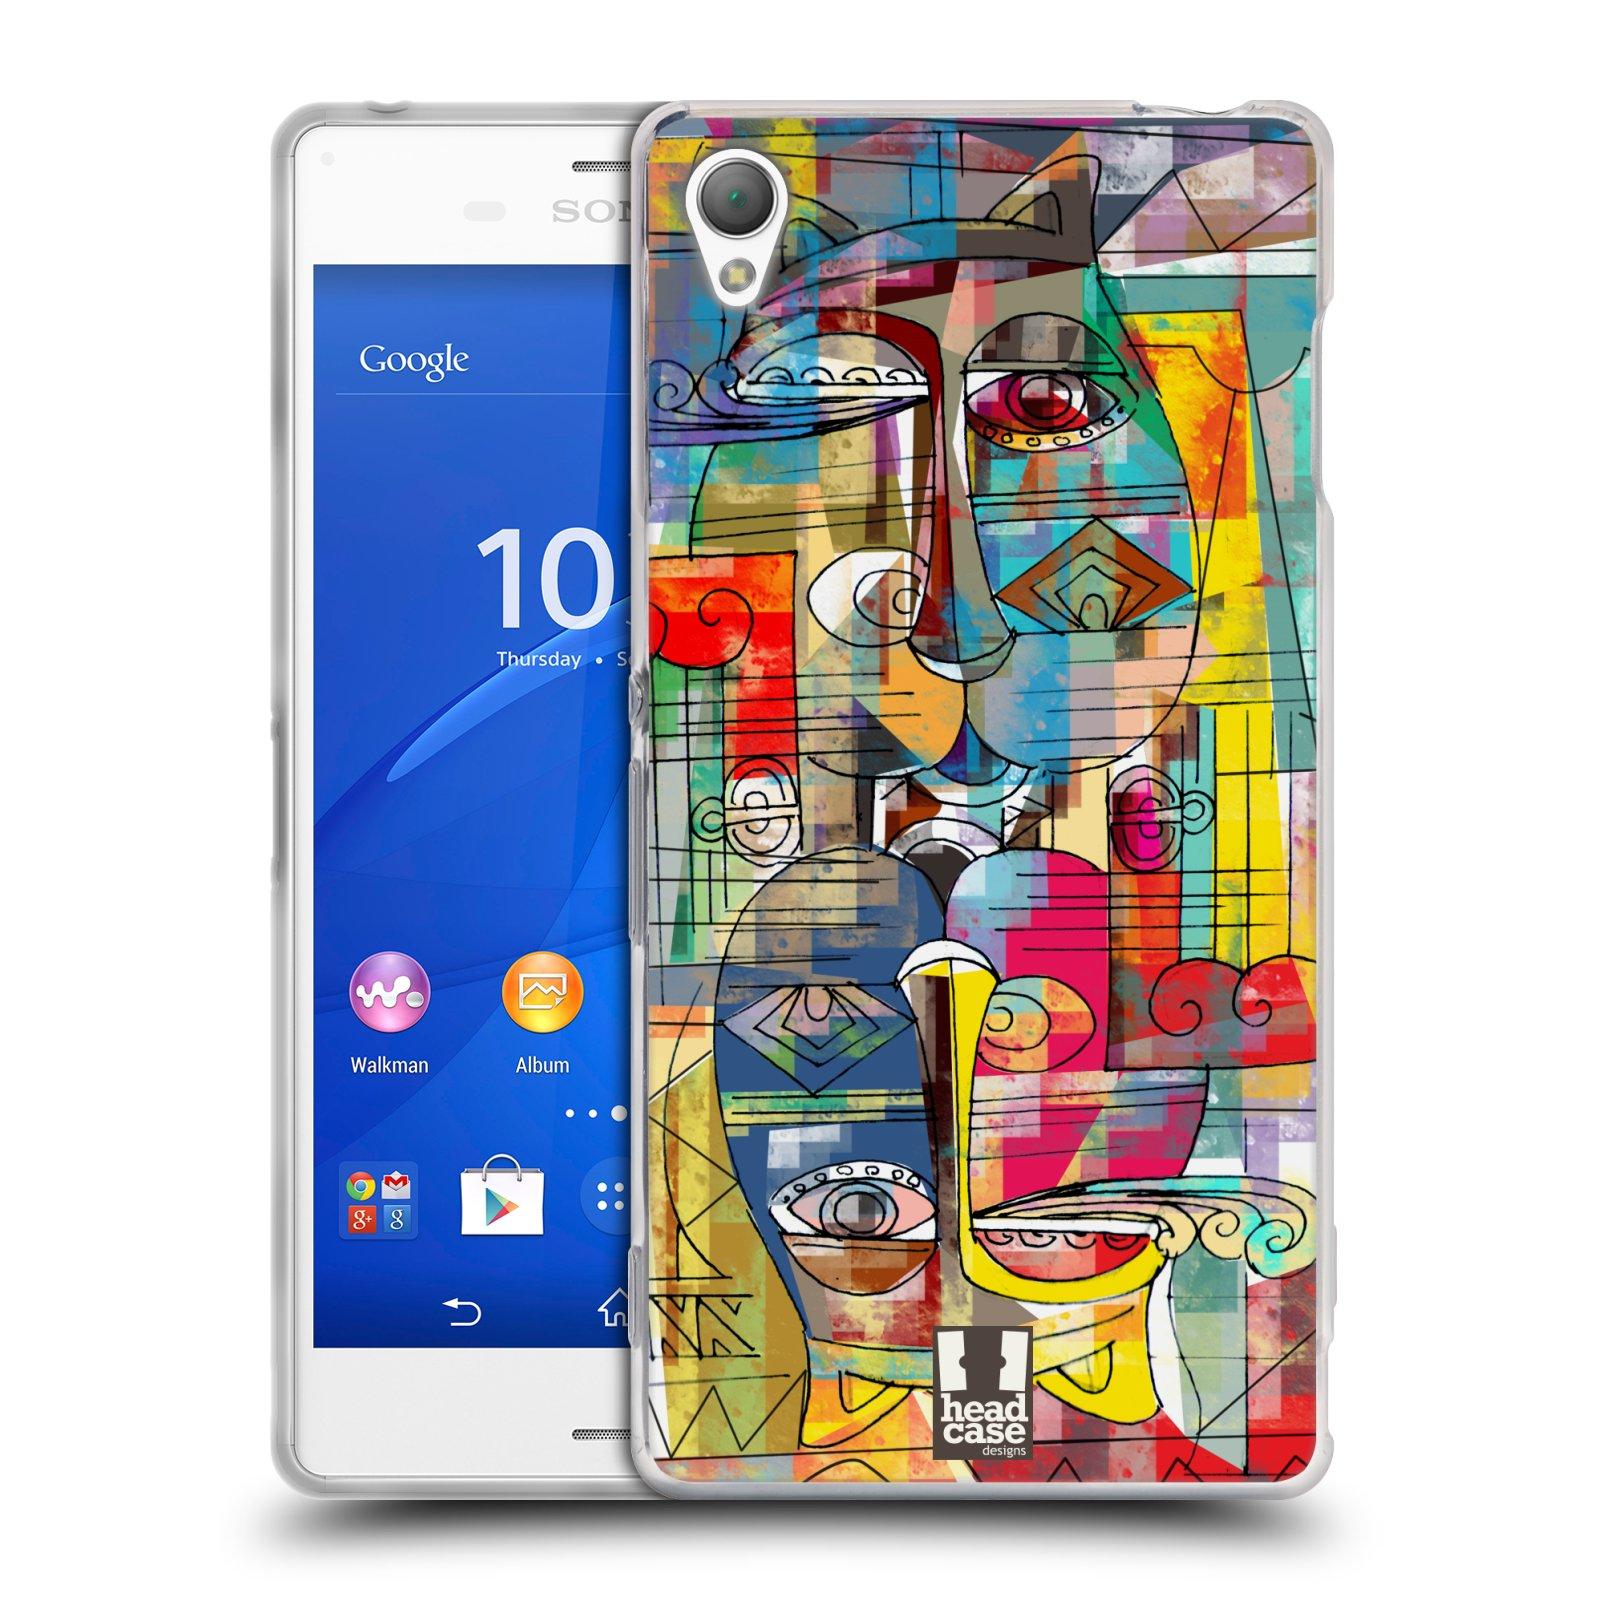 Silikonové pouzdro na mobil Sony Xperia Z3 D6603 HEAD CASE AZTEC MANX